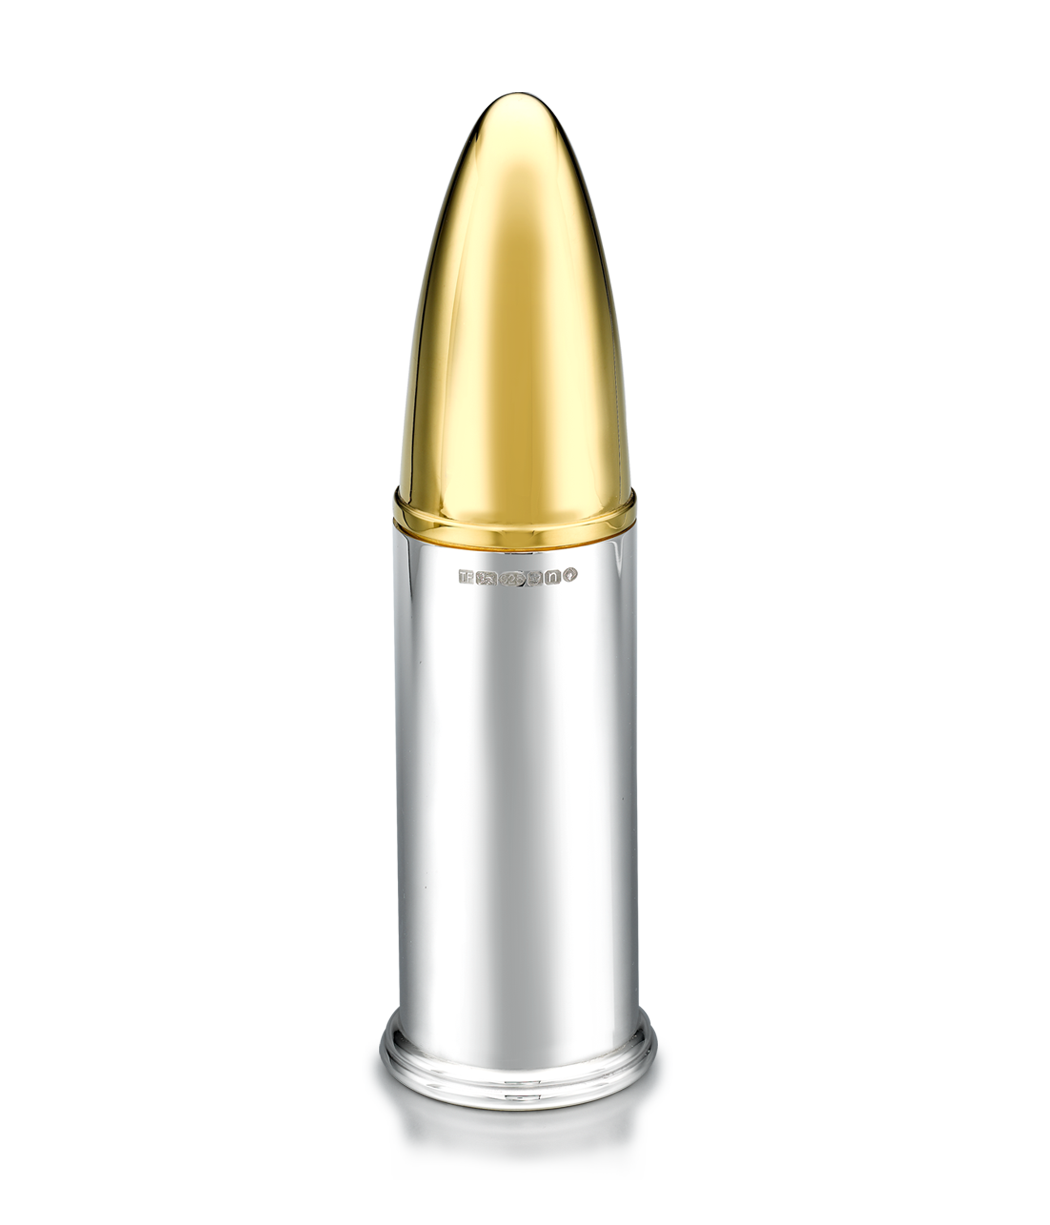 vector royalty free stock Bullet clipart 9mm. Gunshot mm free on